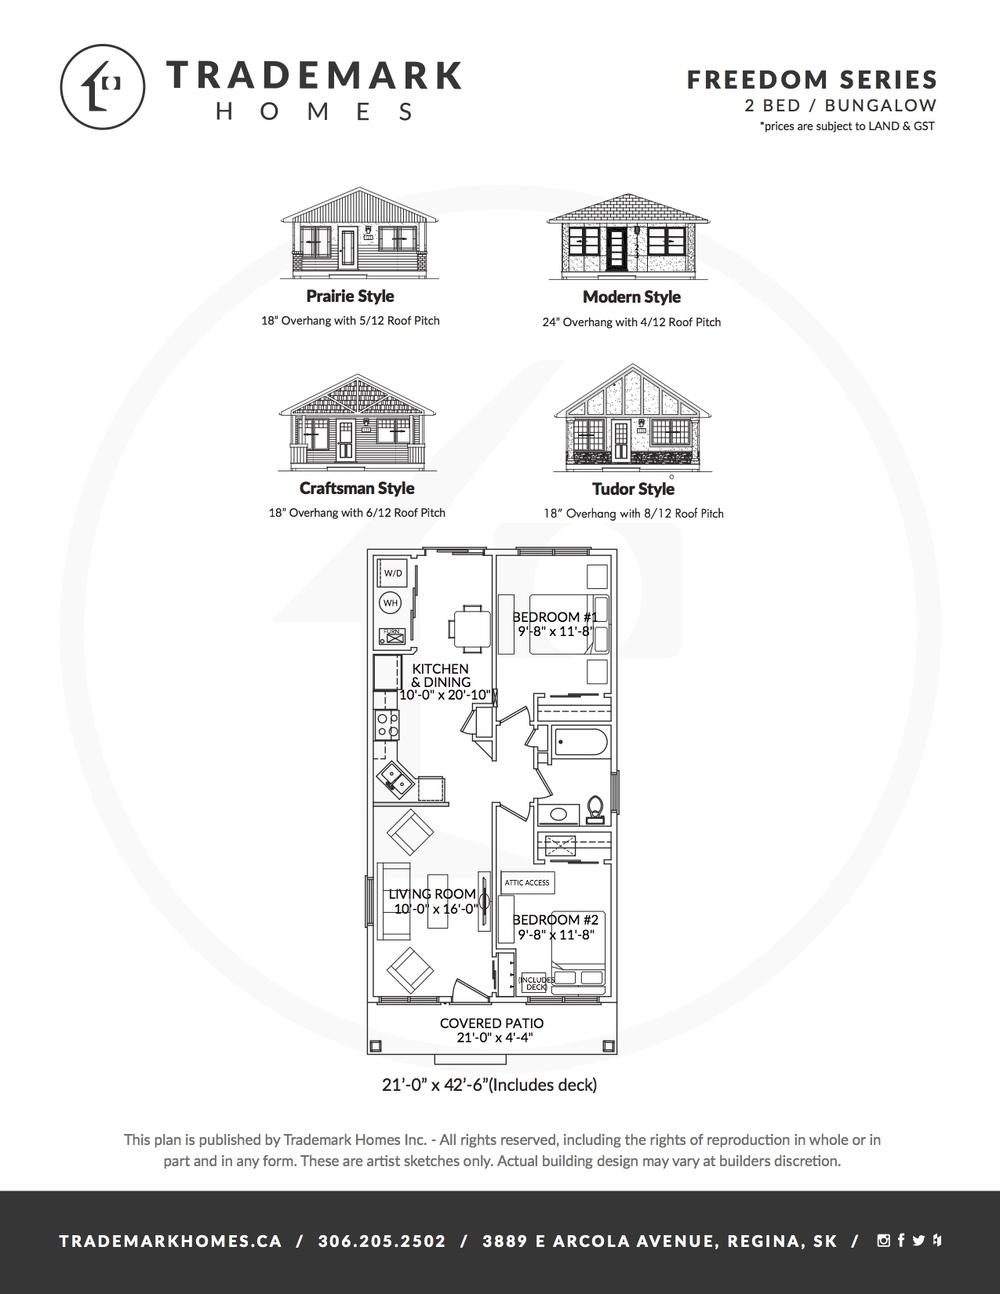 Freedom Series - 2 Bedroom Bungalow - Floorplan